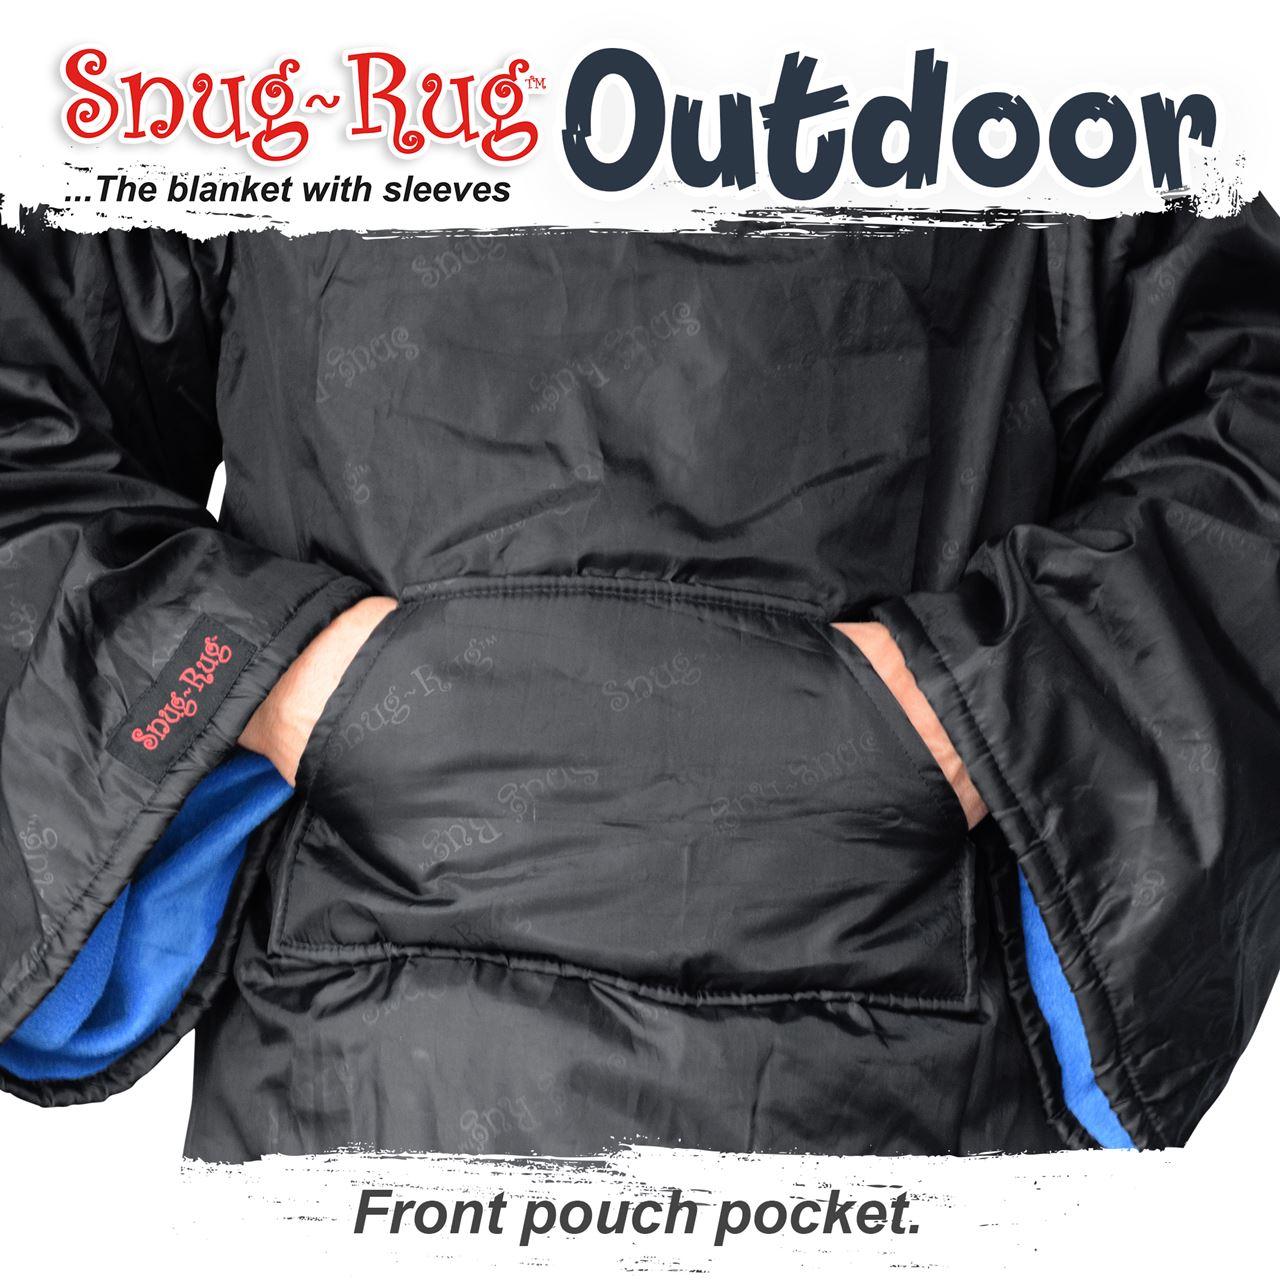 Channel Distribution Gifts En Gadgets Snug Rug Outdoor